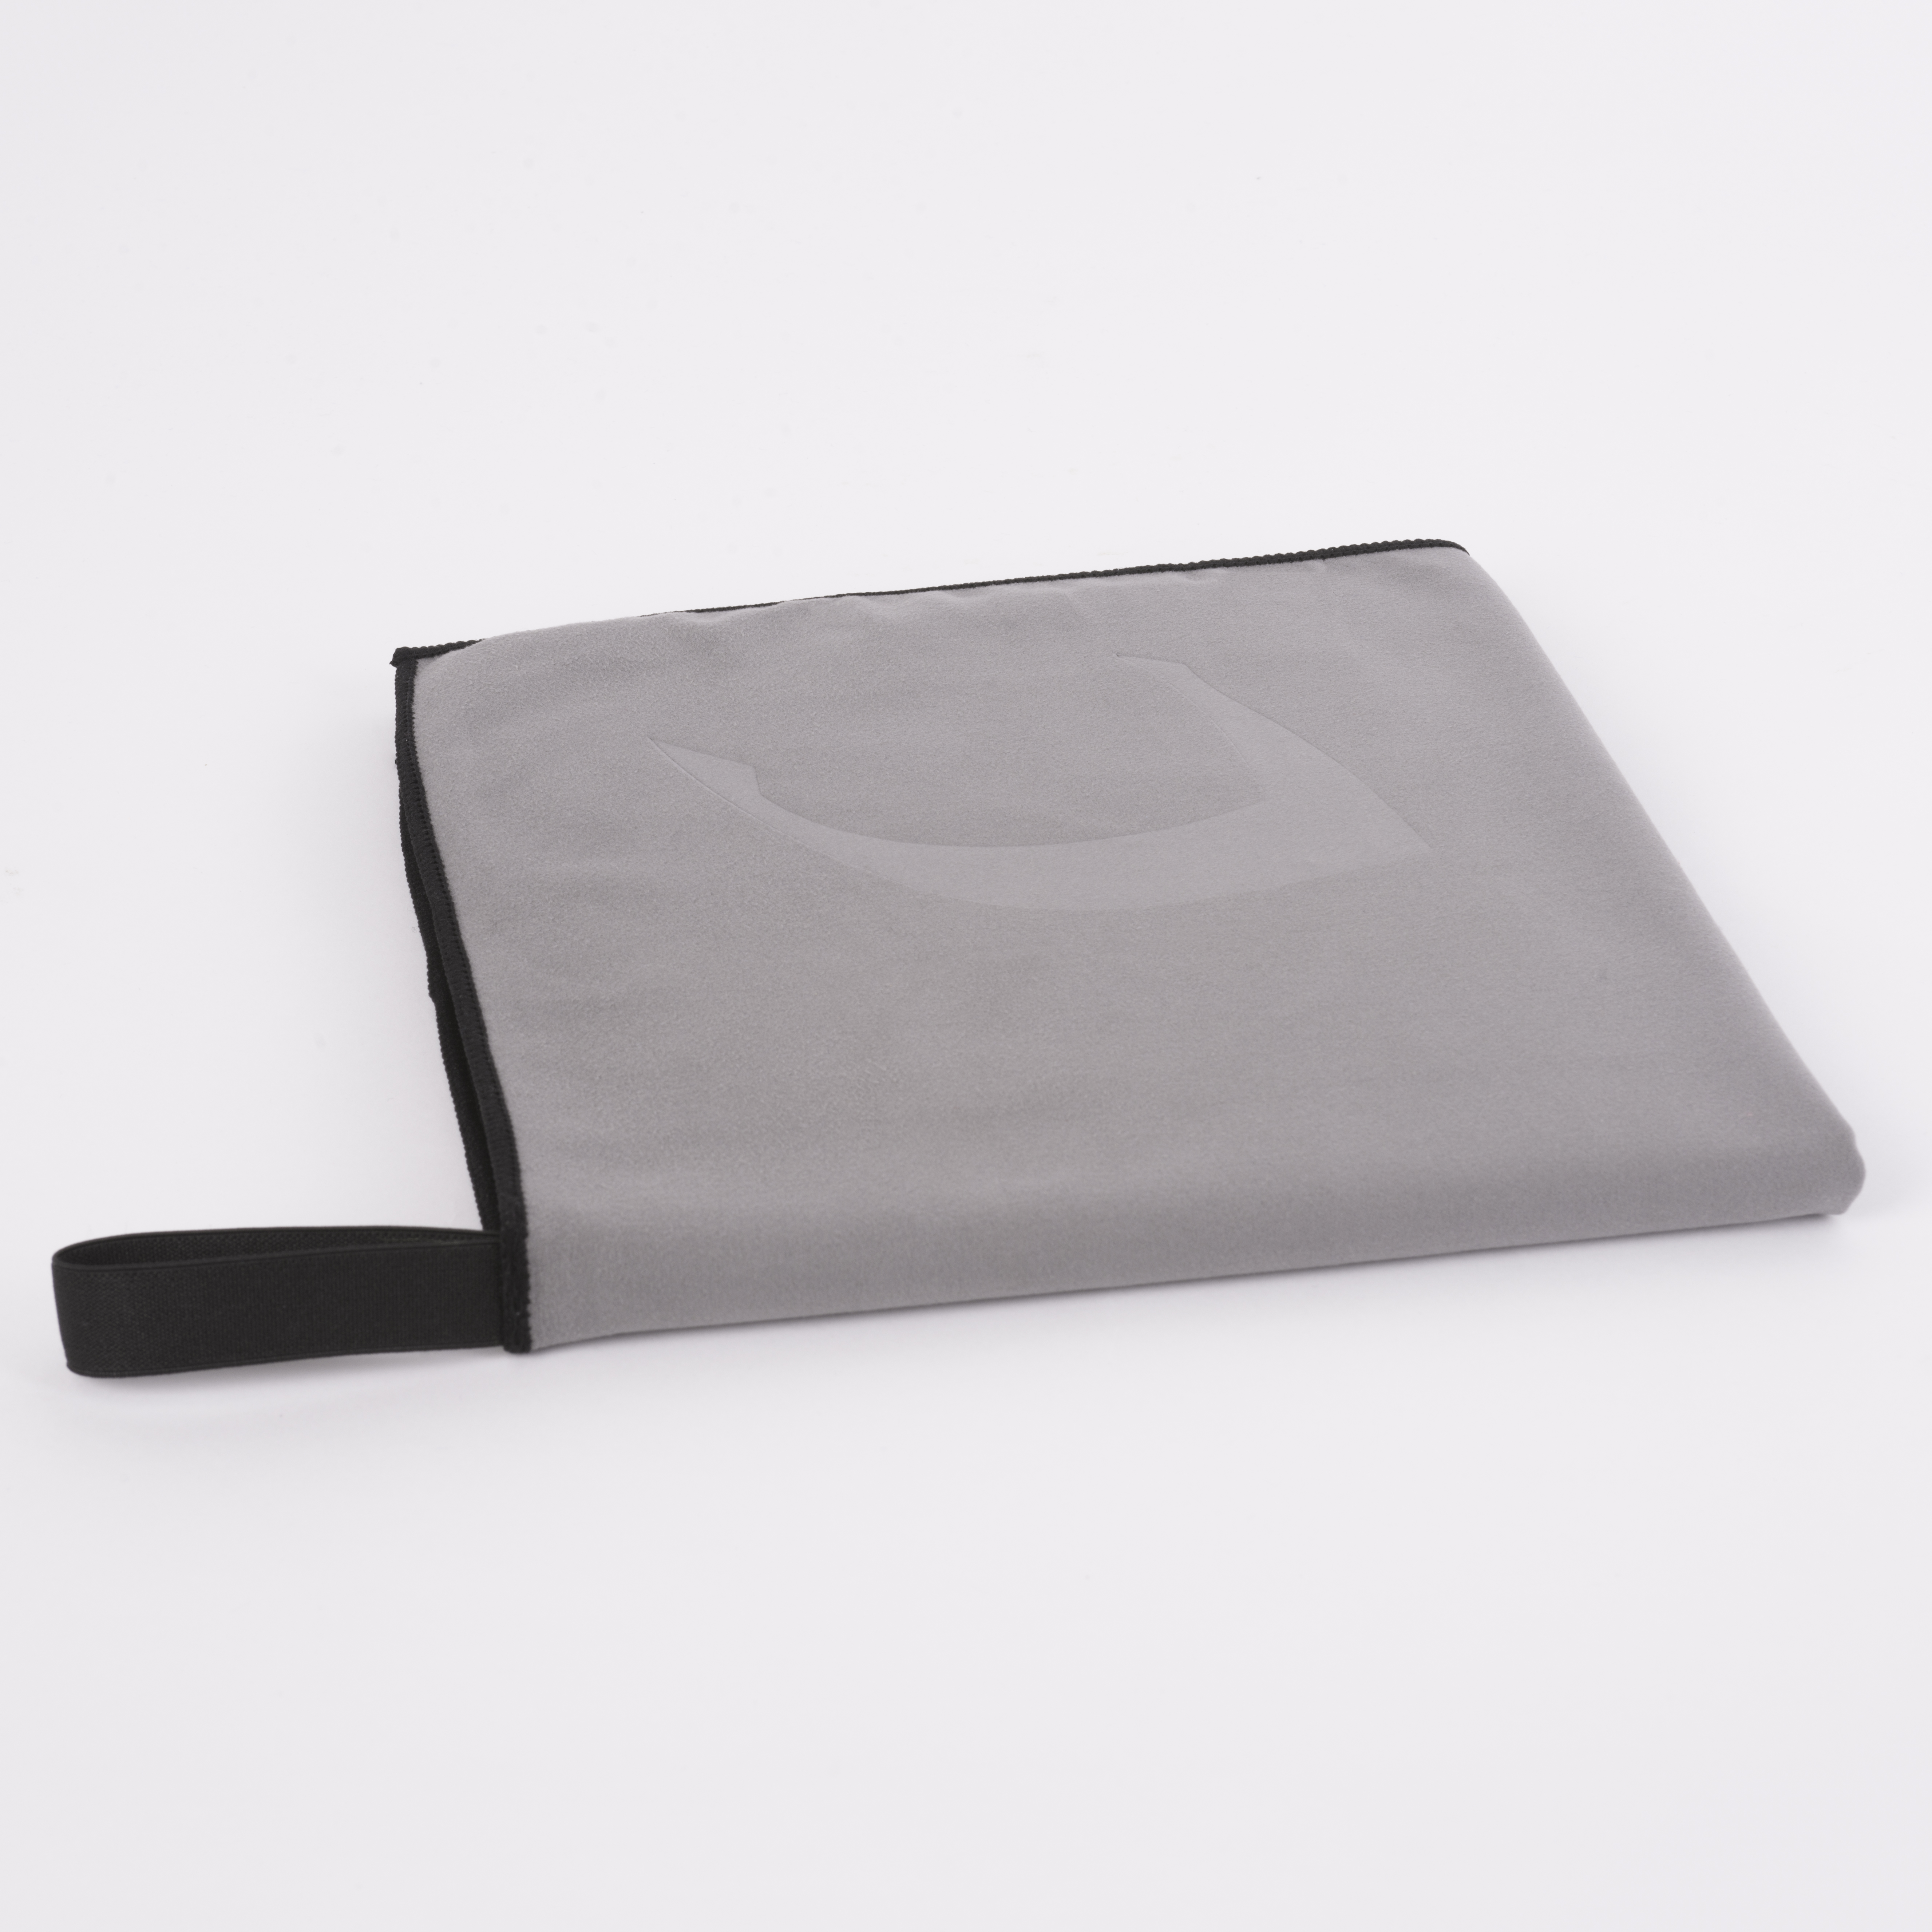 Clarysse Microvezel sneldrogende badlaken 80x150 Grijs